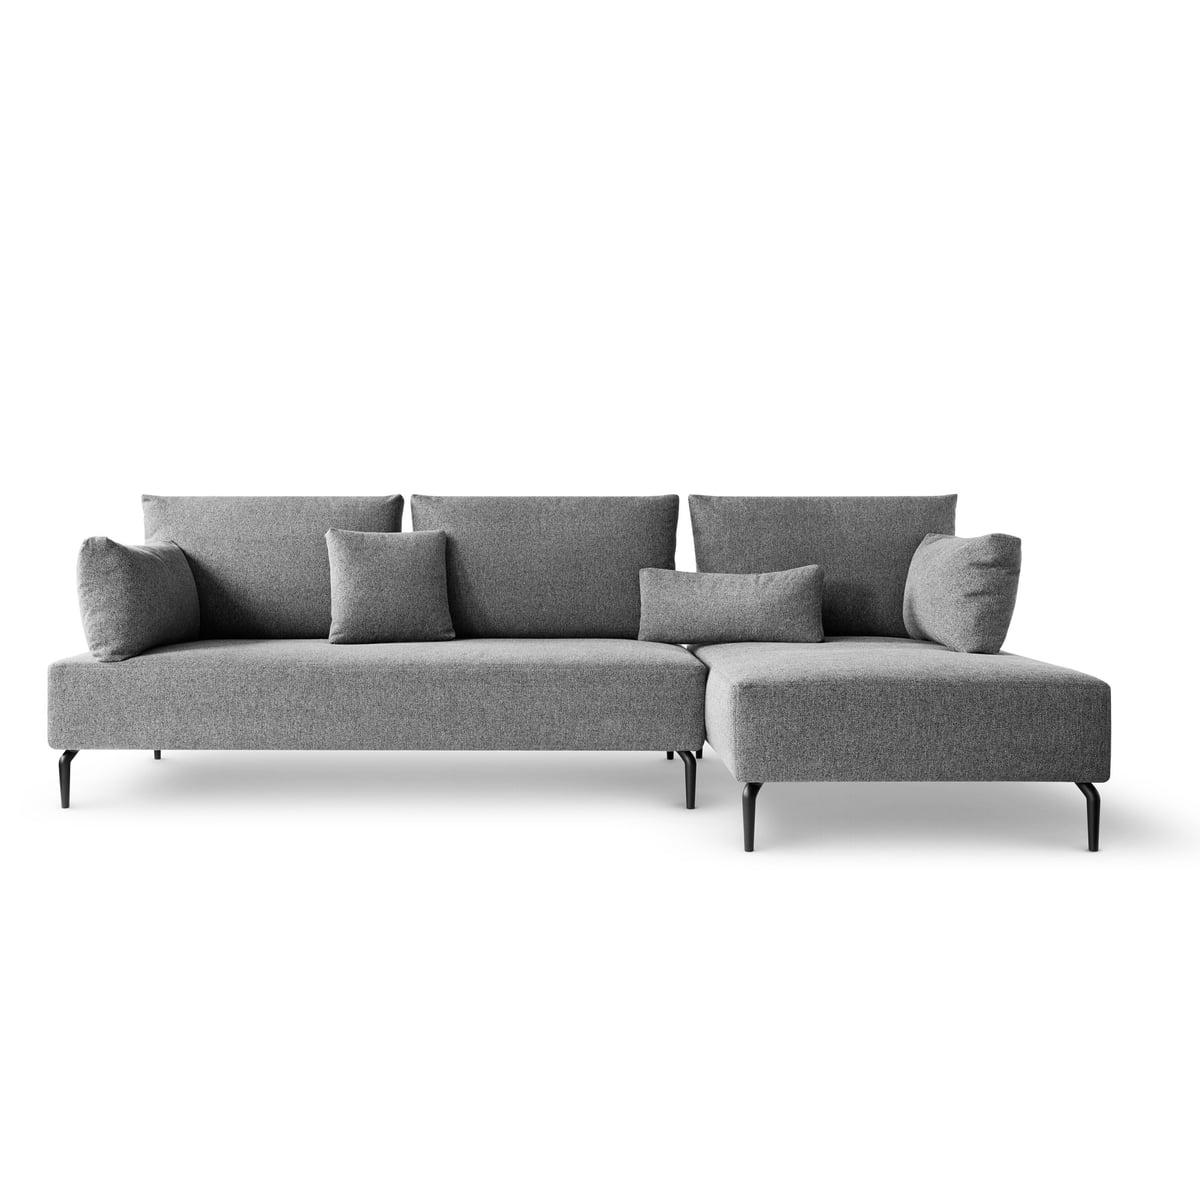 Wondrous Eva Solo Yoga Modular Sofa Chaise Longue Right Ibusinesslaw Wood Chair Design Ideas Ibusinesslaworg